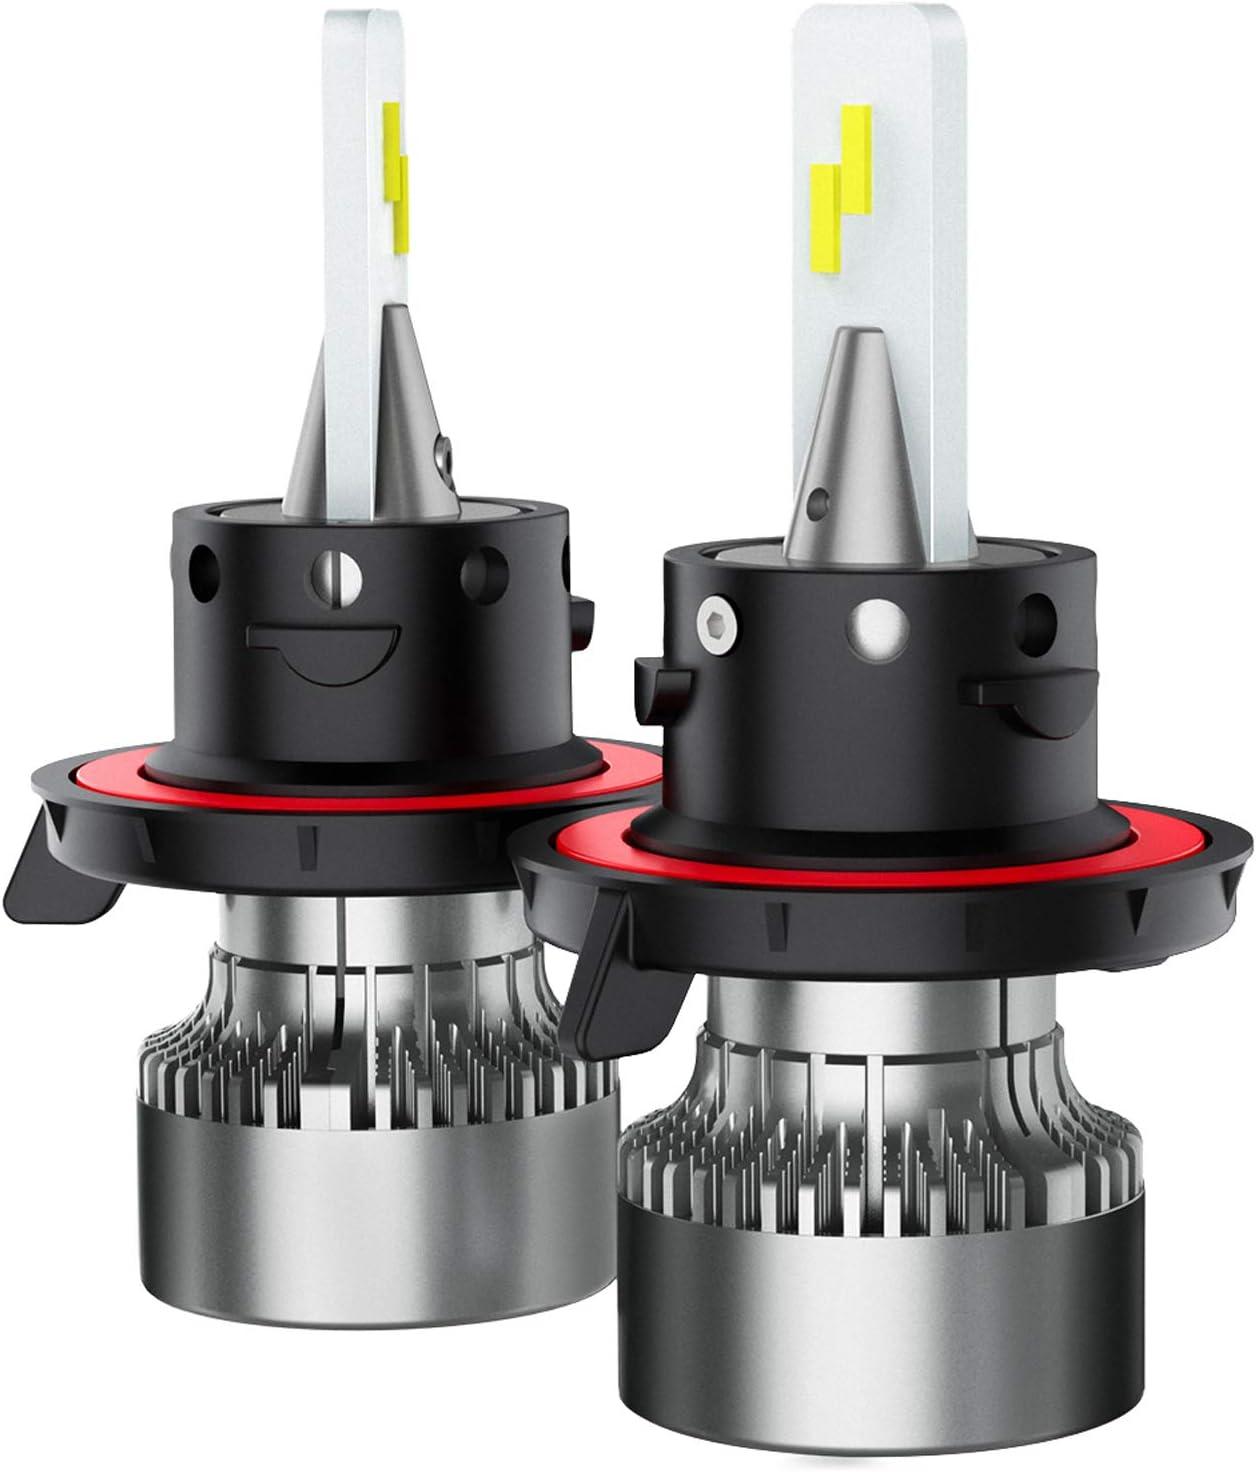 TIANFUYAO H13 New life 9008 LED Headlight Bulbs - 6000K 100W San Diego Mall 12000LM Xeno